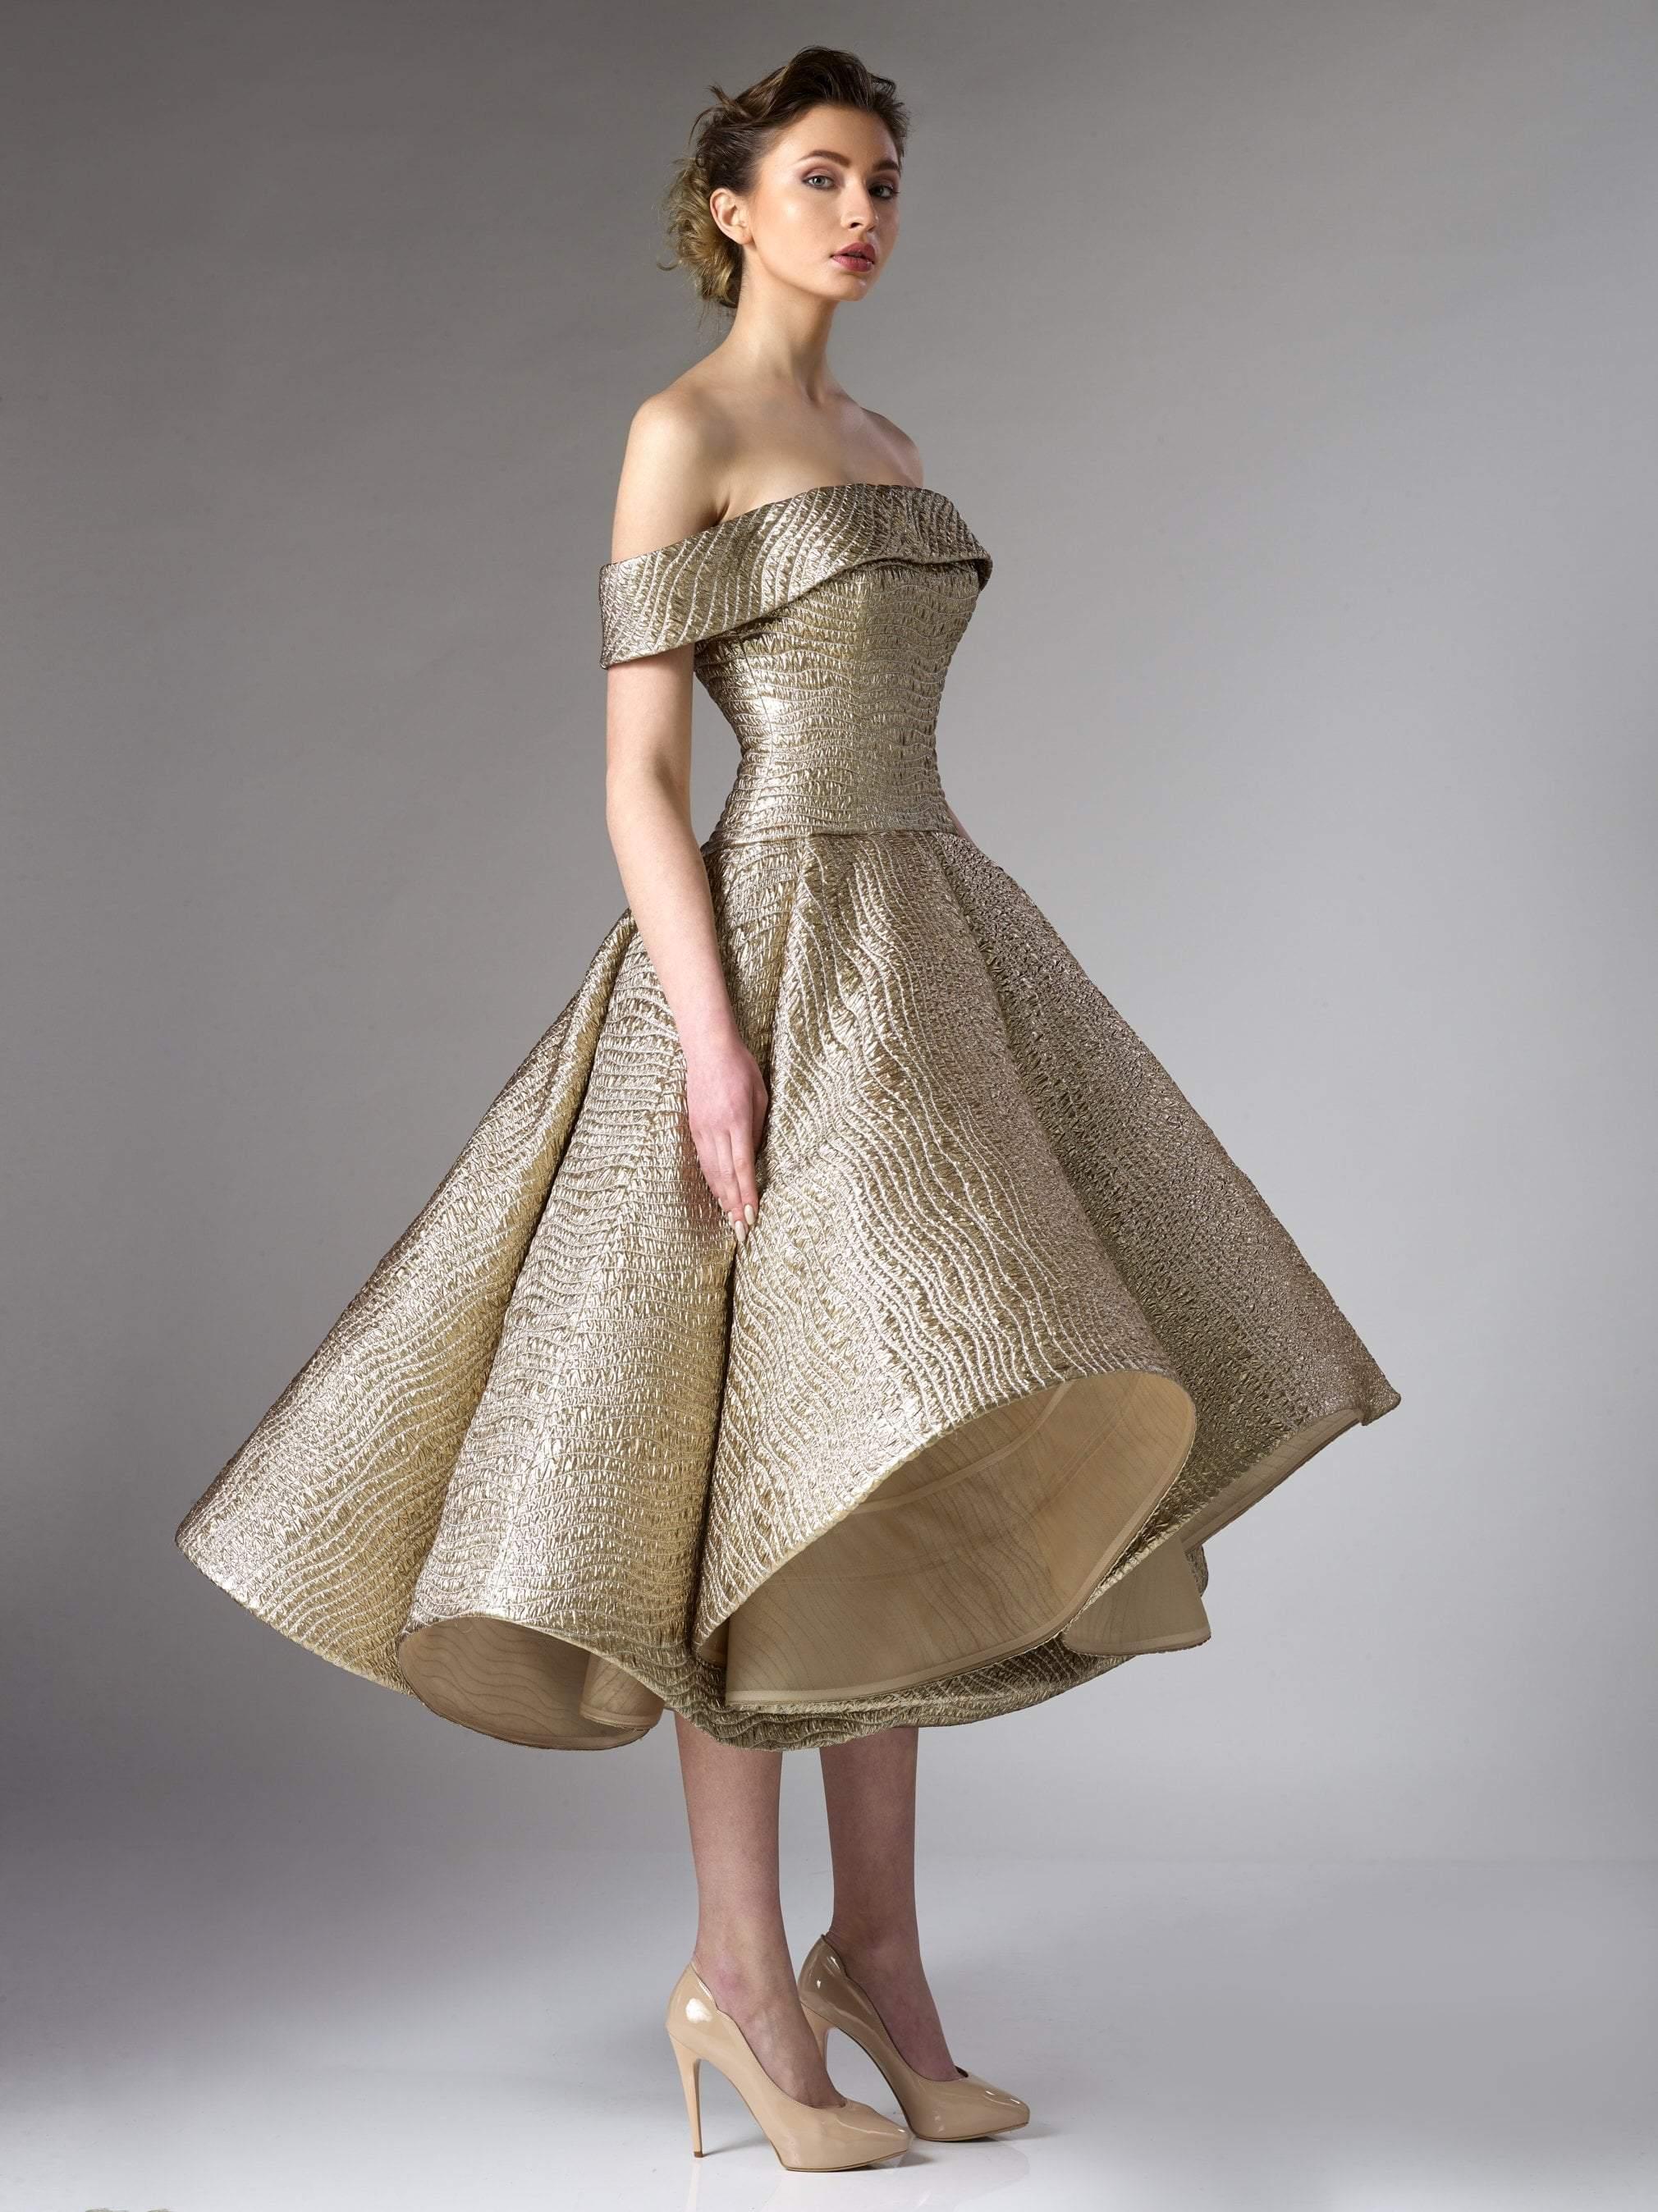 Edward Arsouni Couture - 281 Brocade A-line Dress In Copper